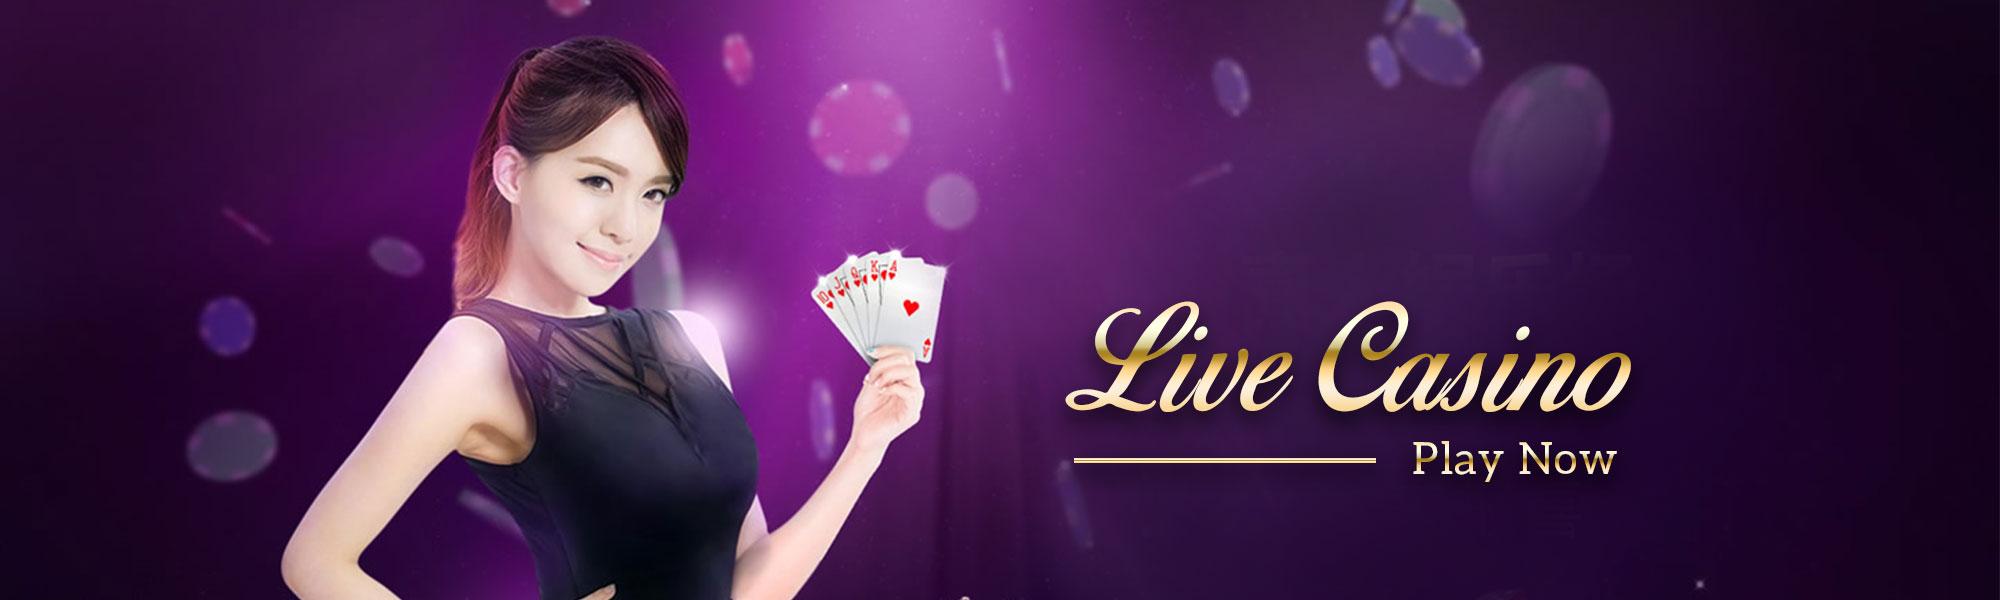 online casino jobs israel